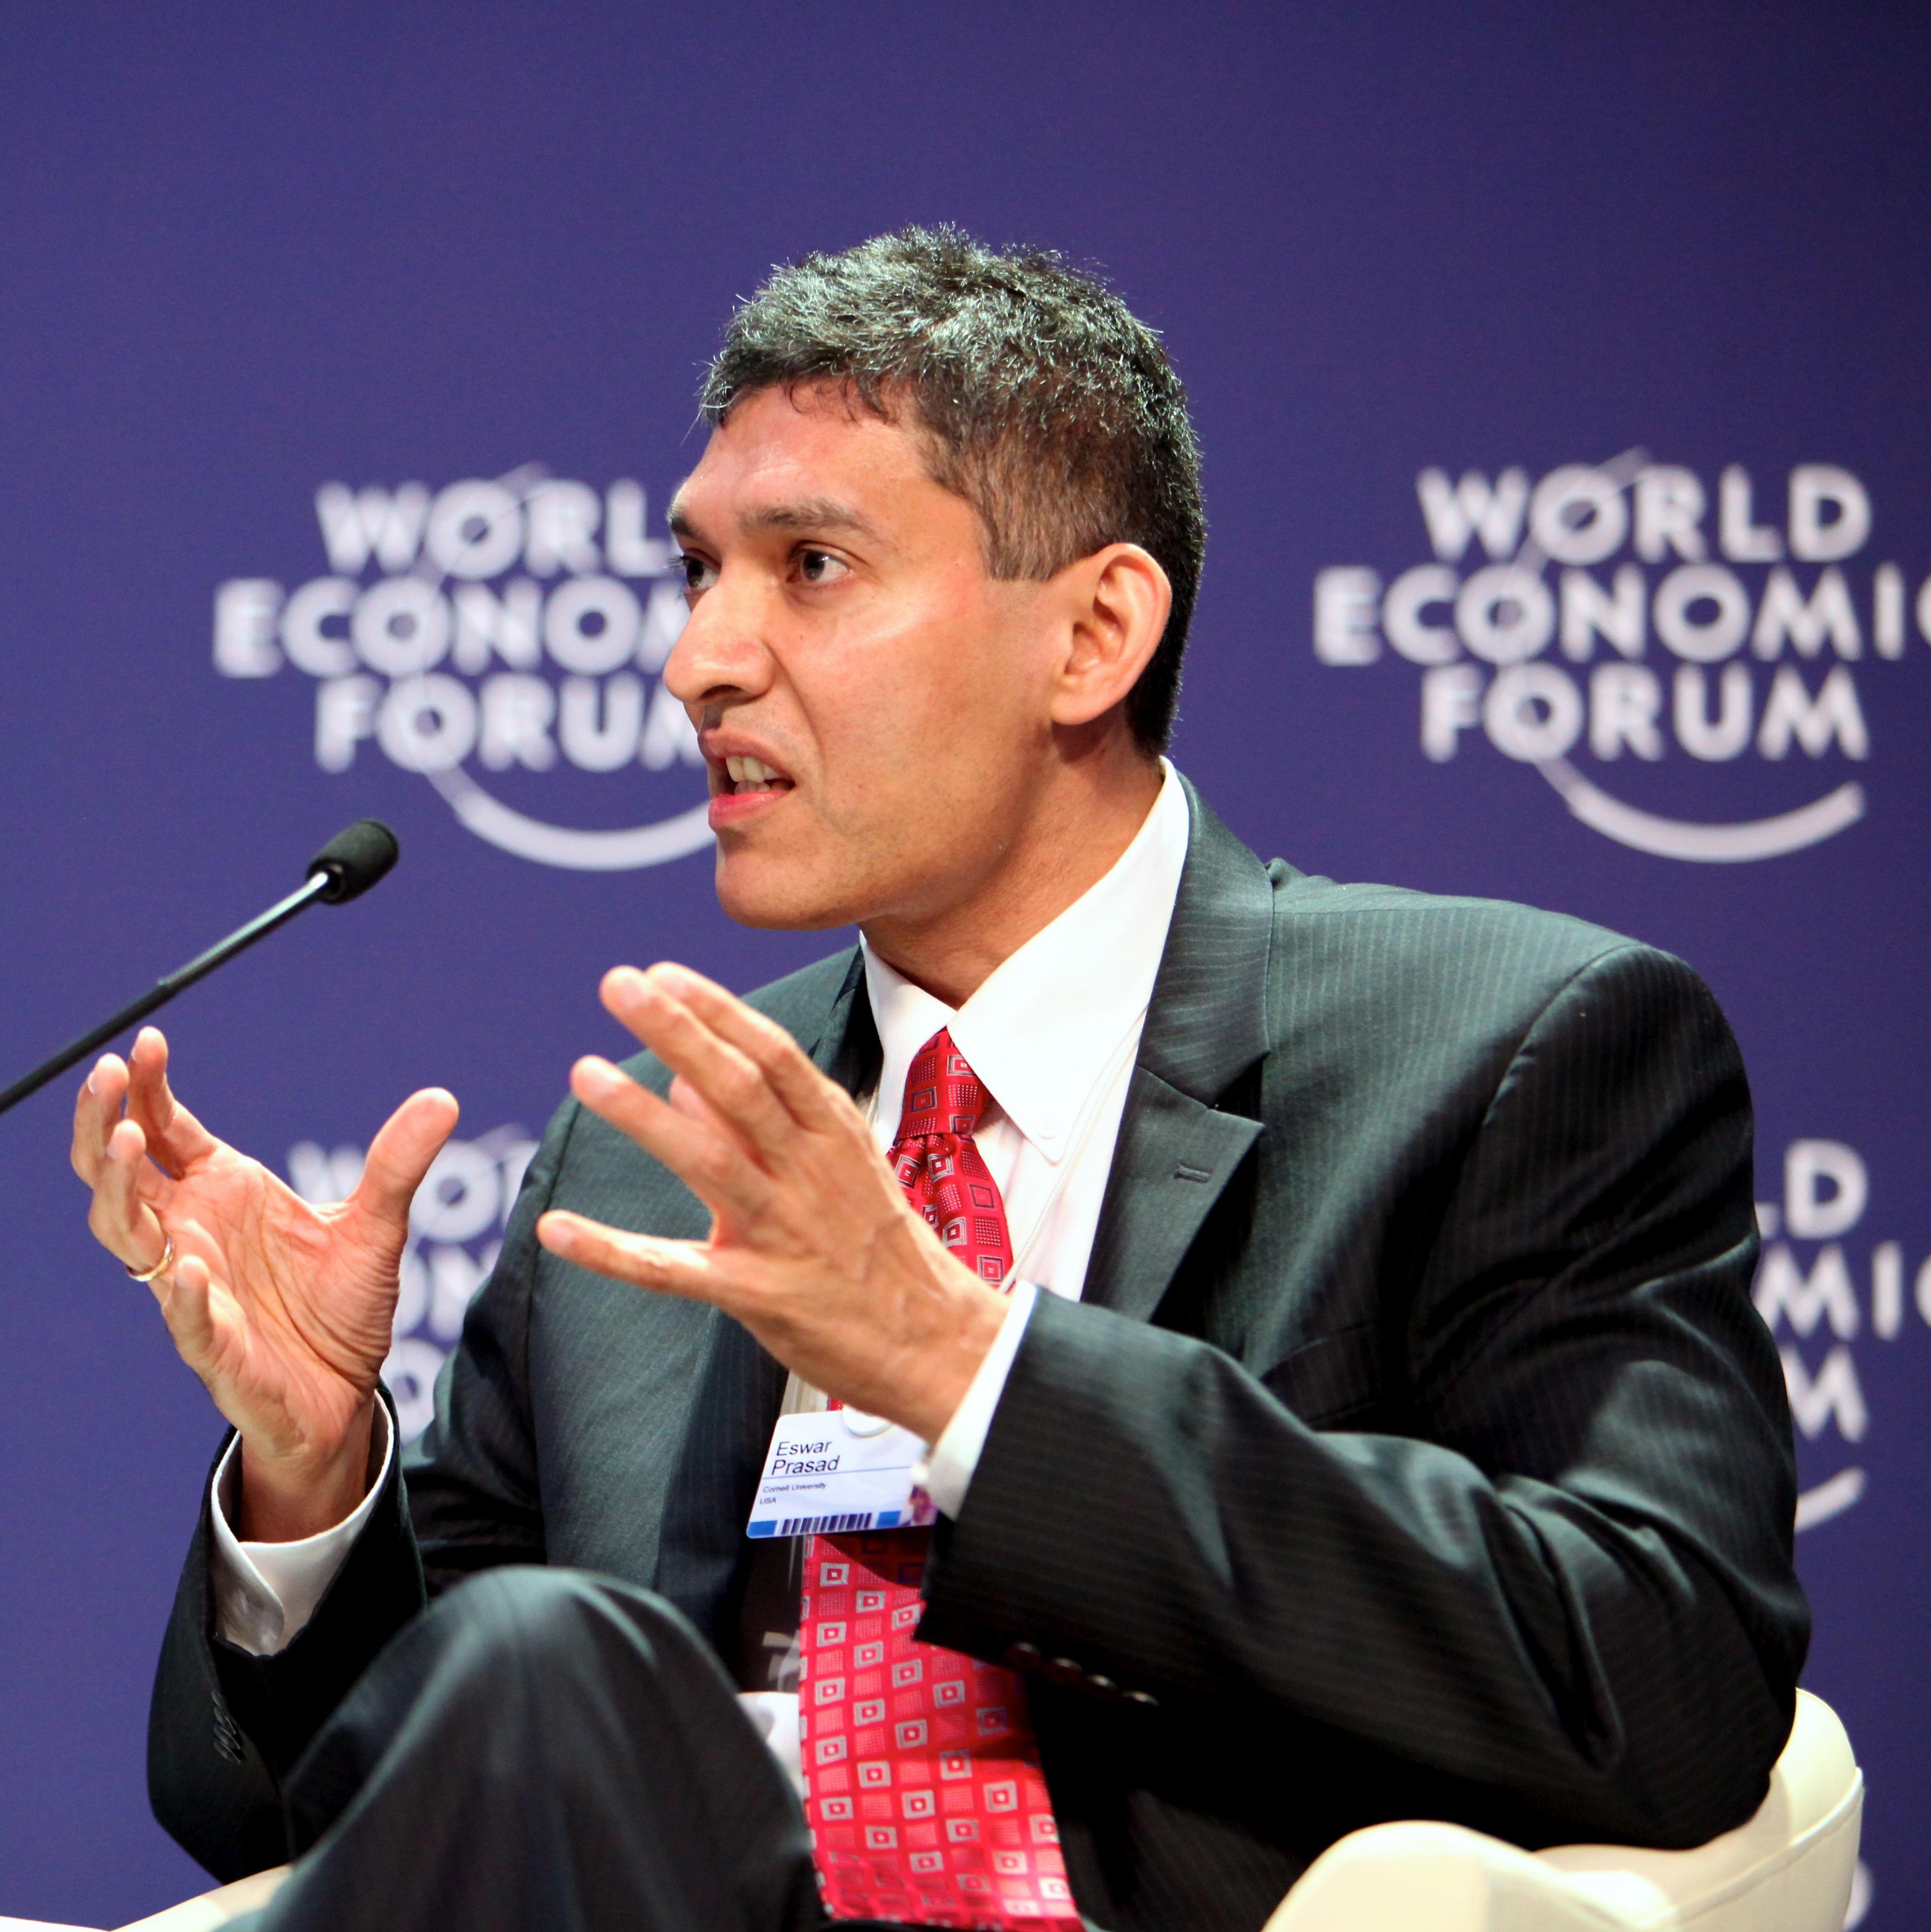 World Economic Forum on East Asia, 2012